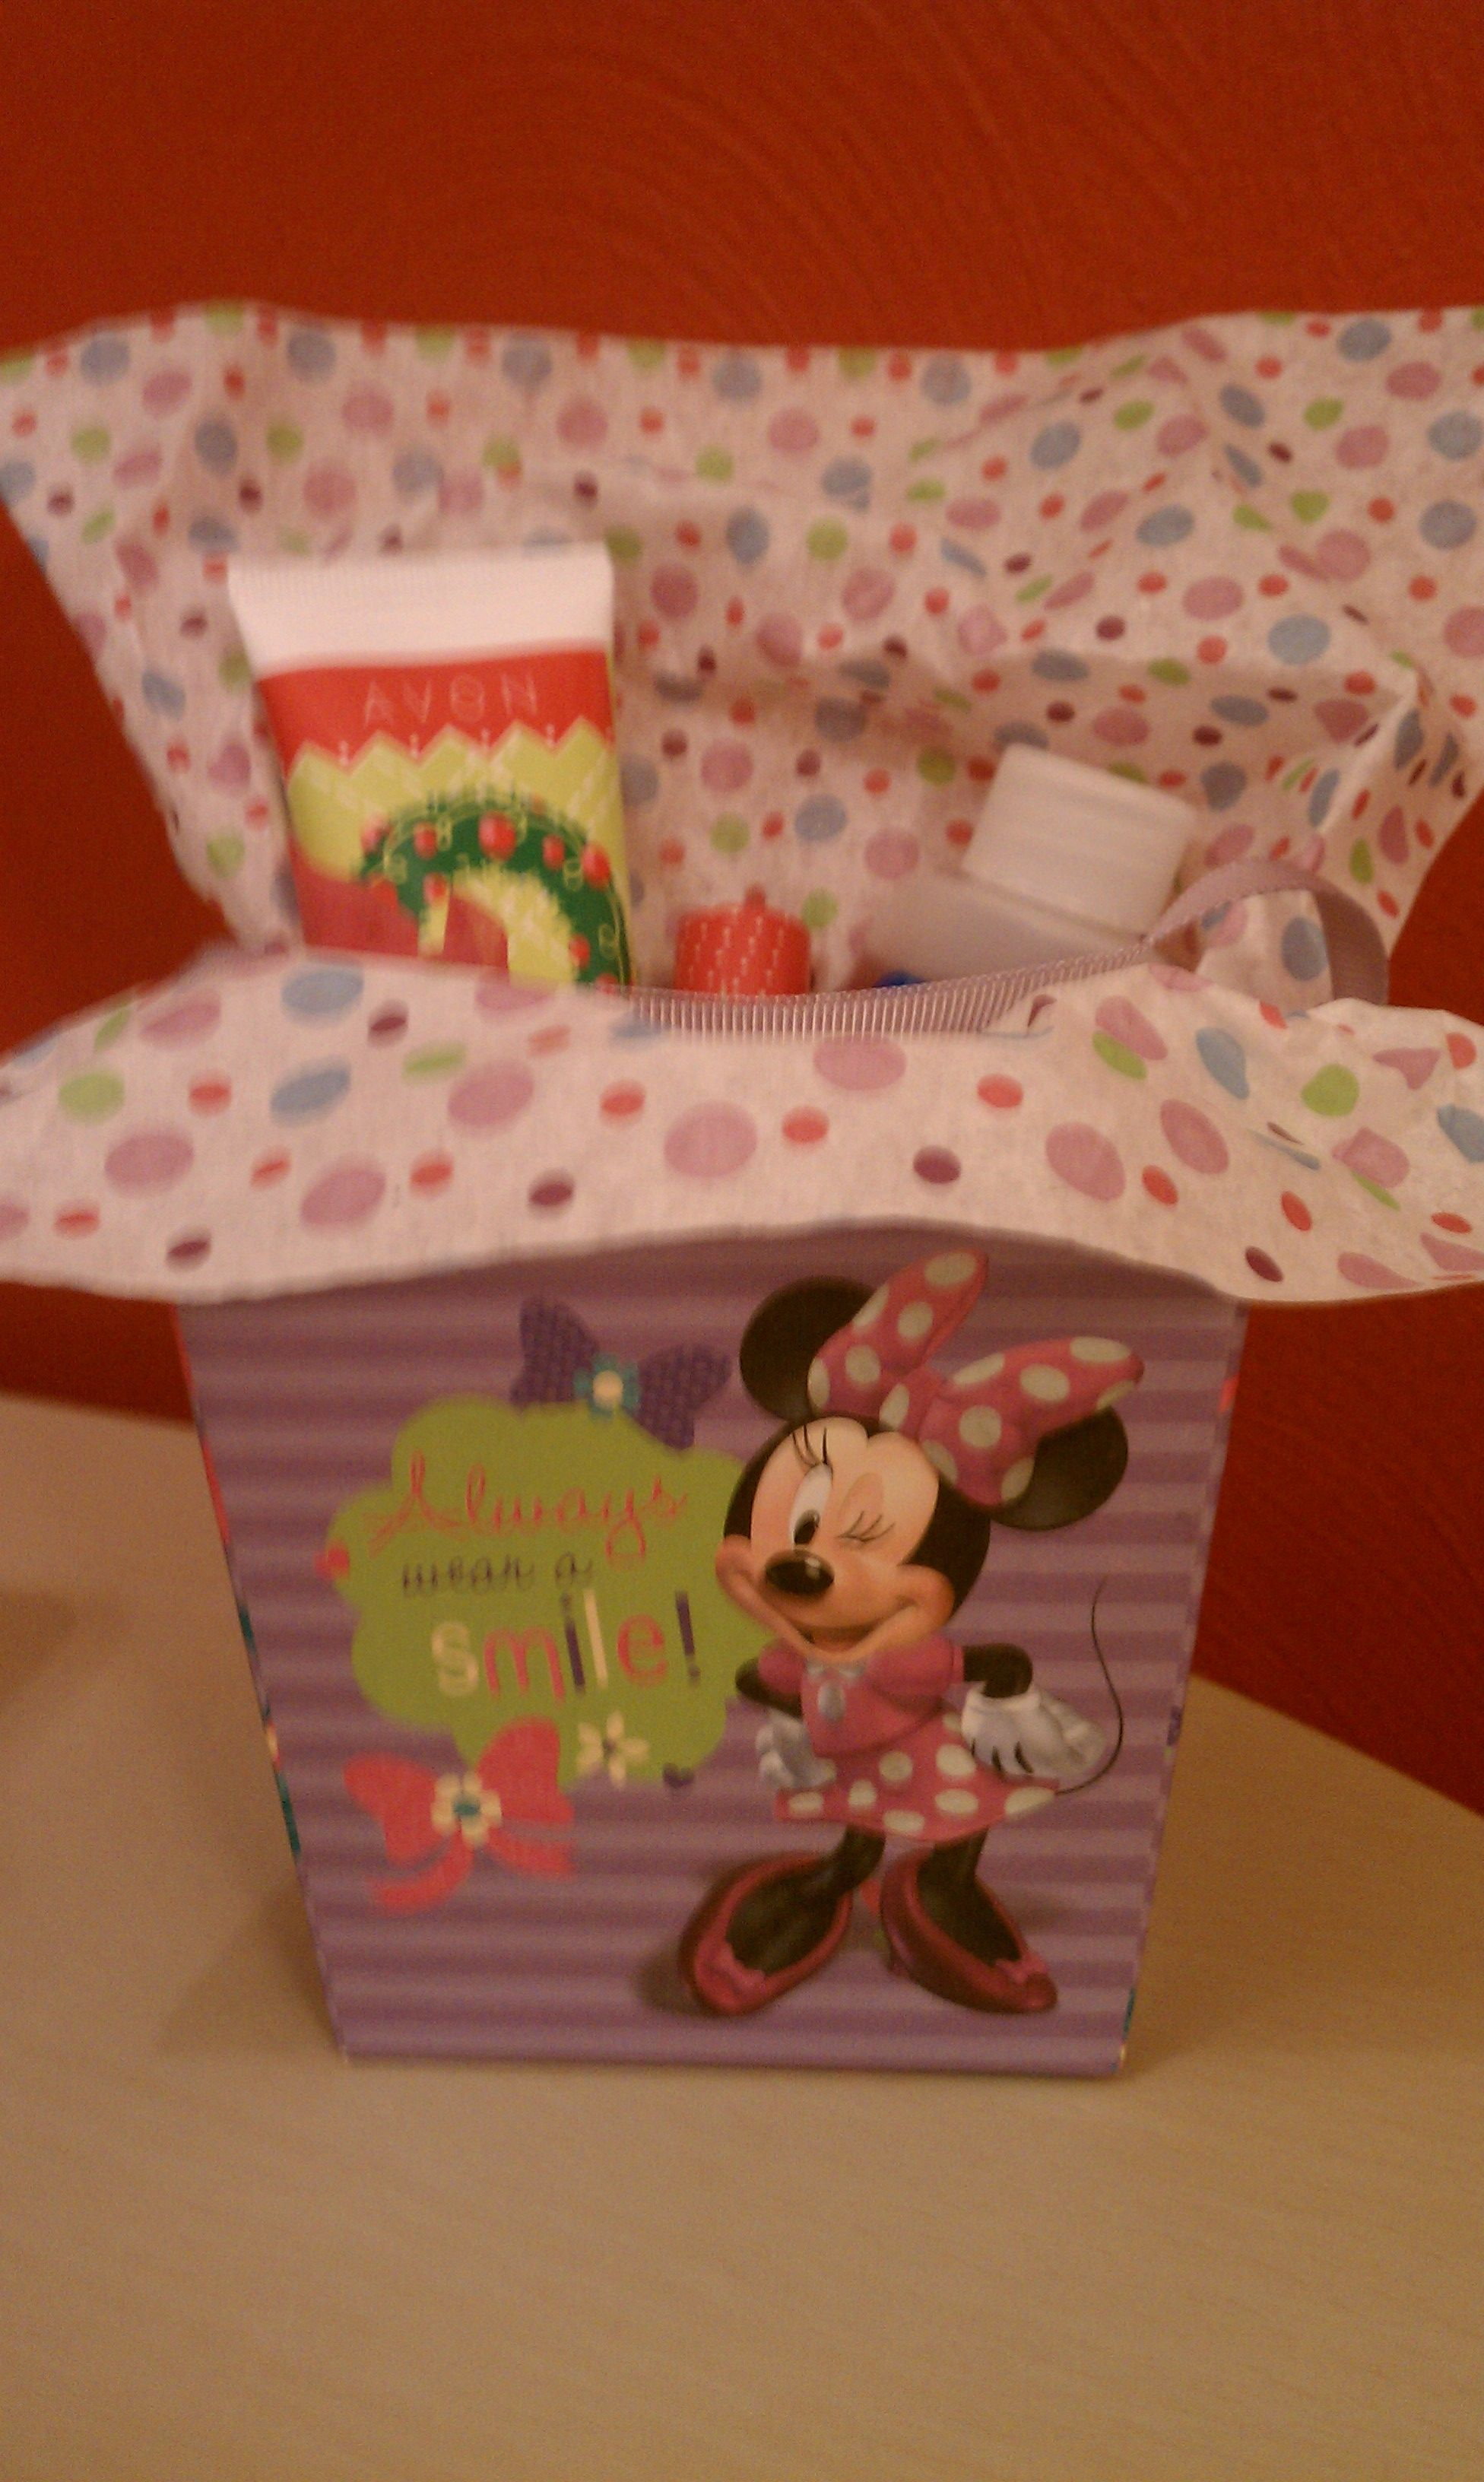 5 Avon Kid S Gift Pack Includes Hand Sanitizer Hand Cream